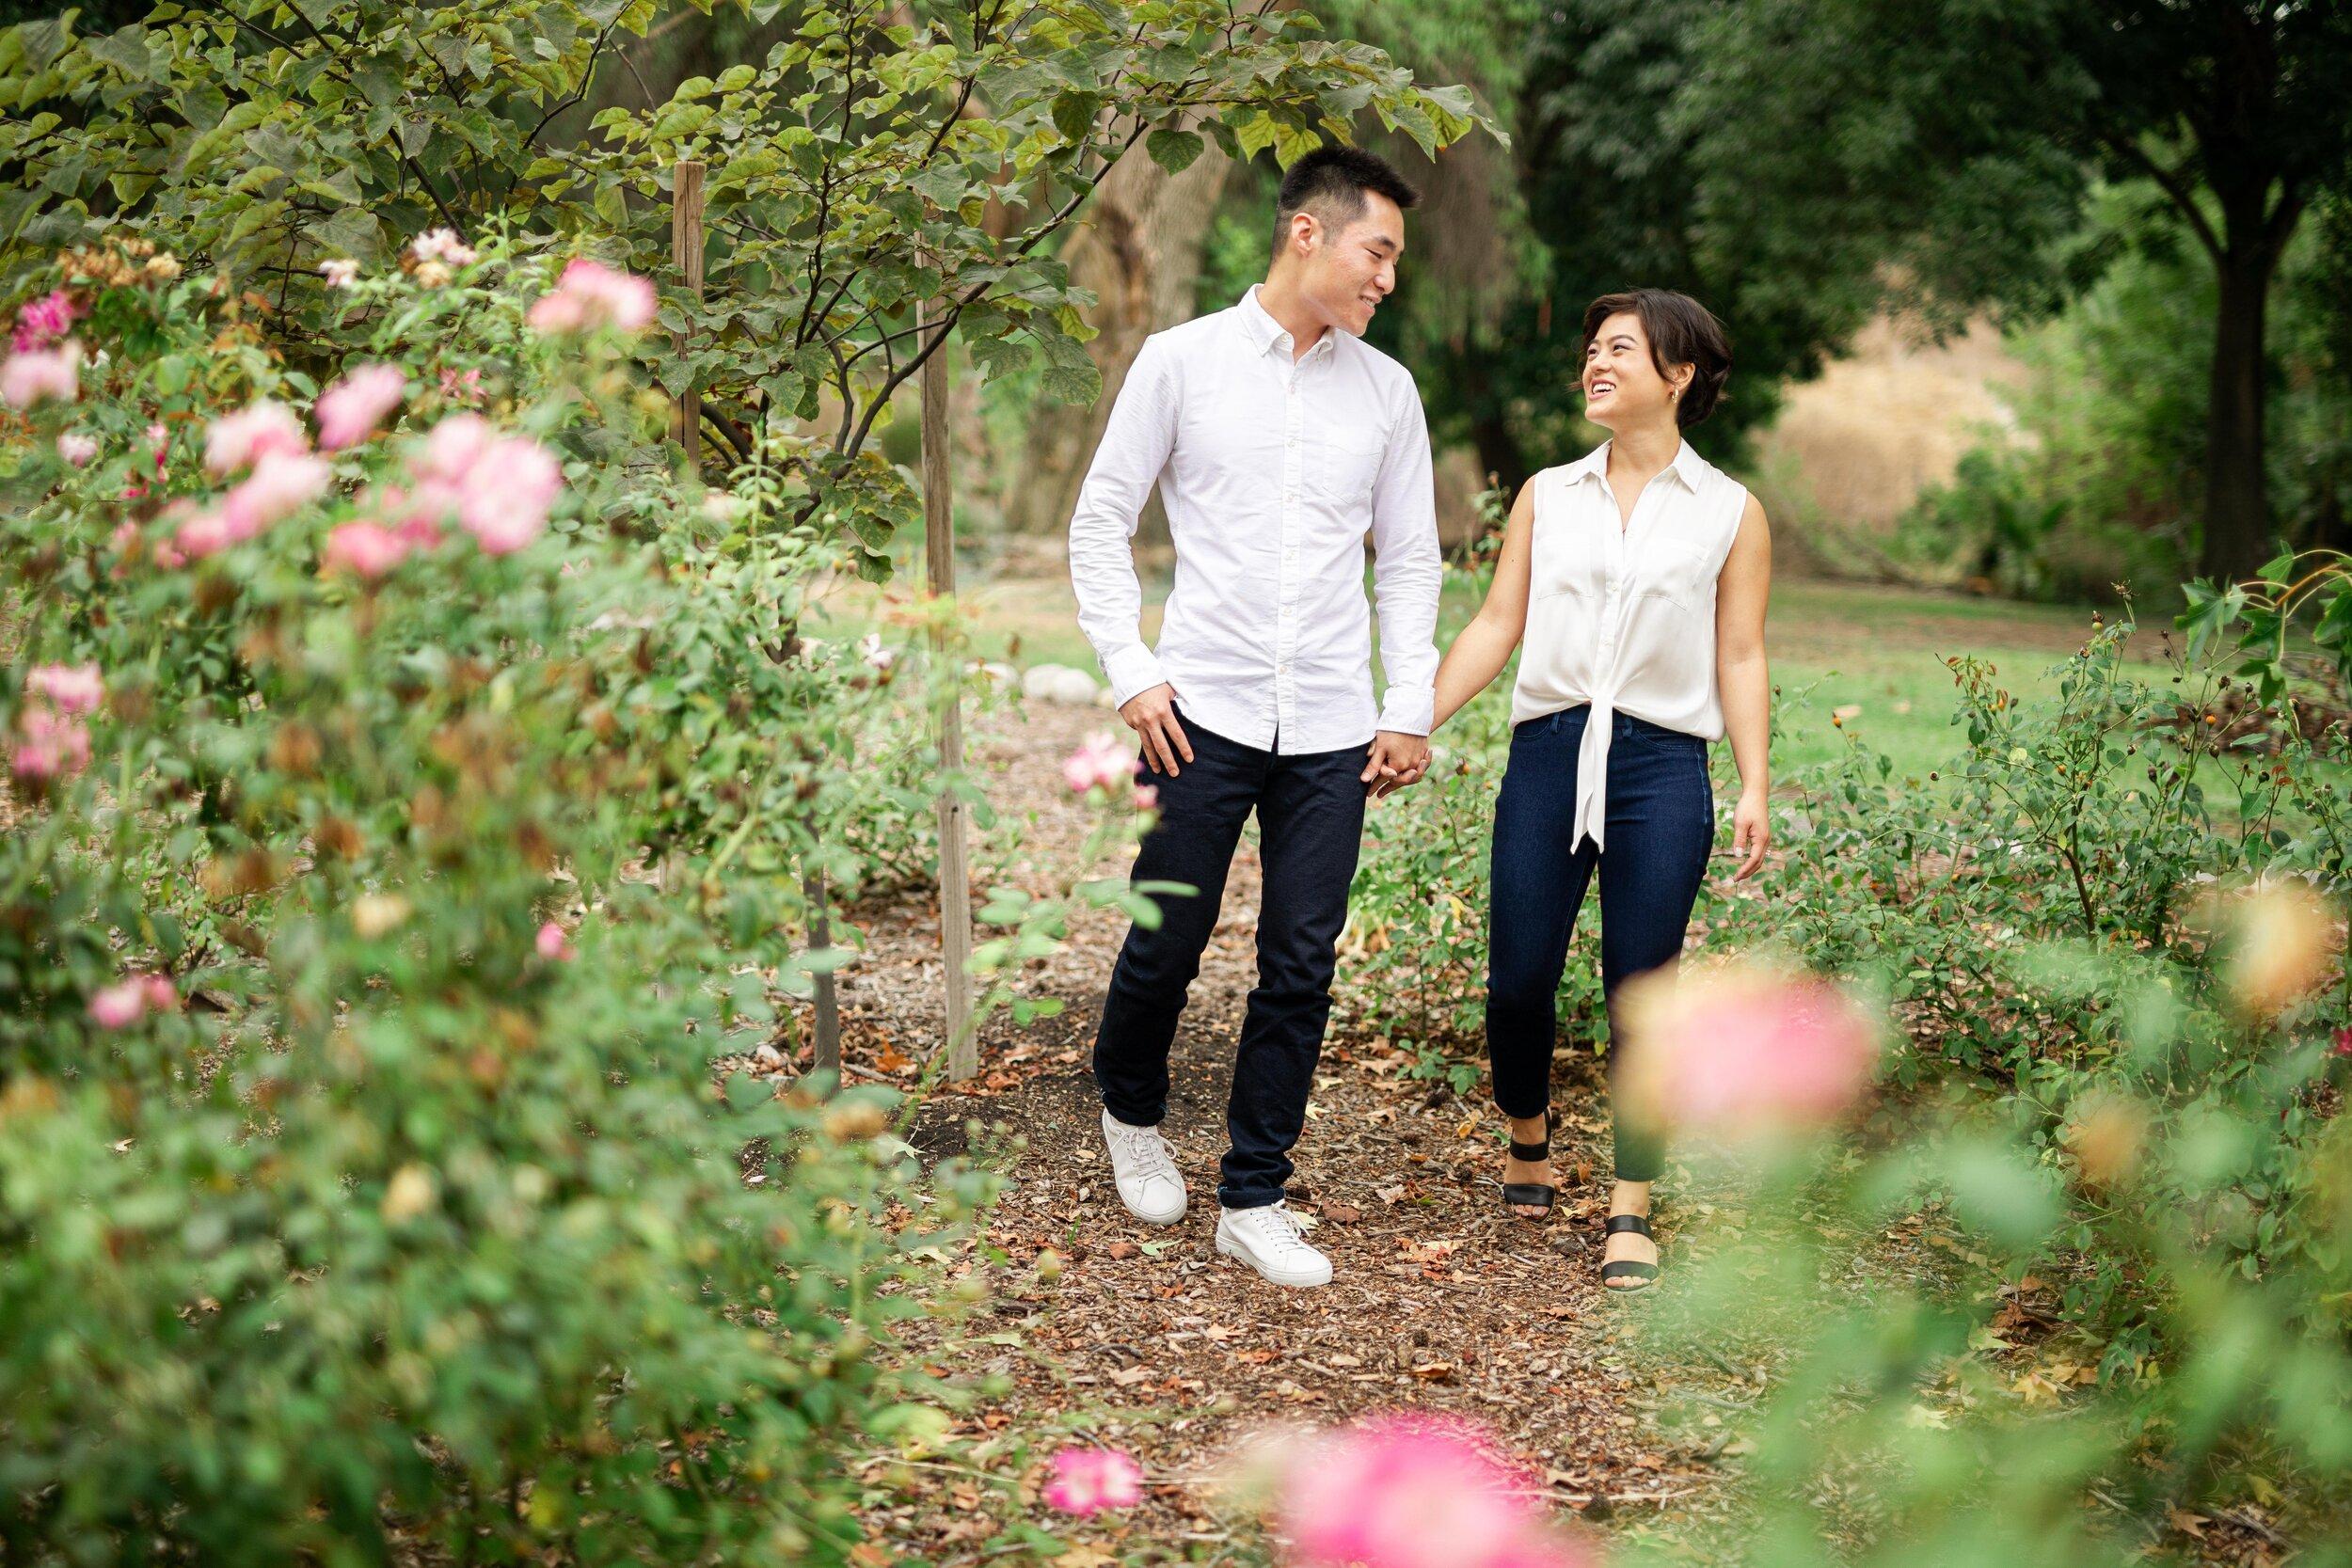 rowland_heights_schabarum_park_engagement_photos_joshua_chun_photography-1397.jpg